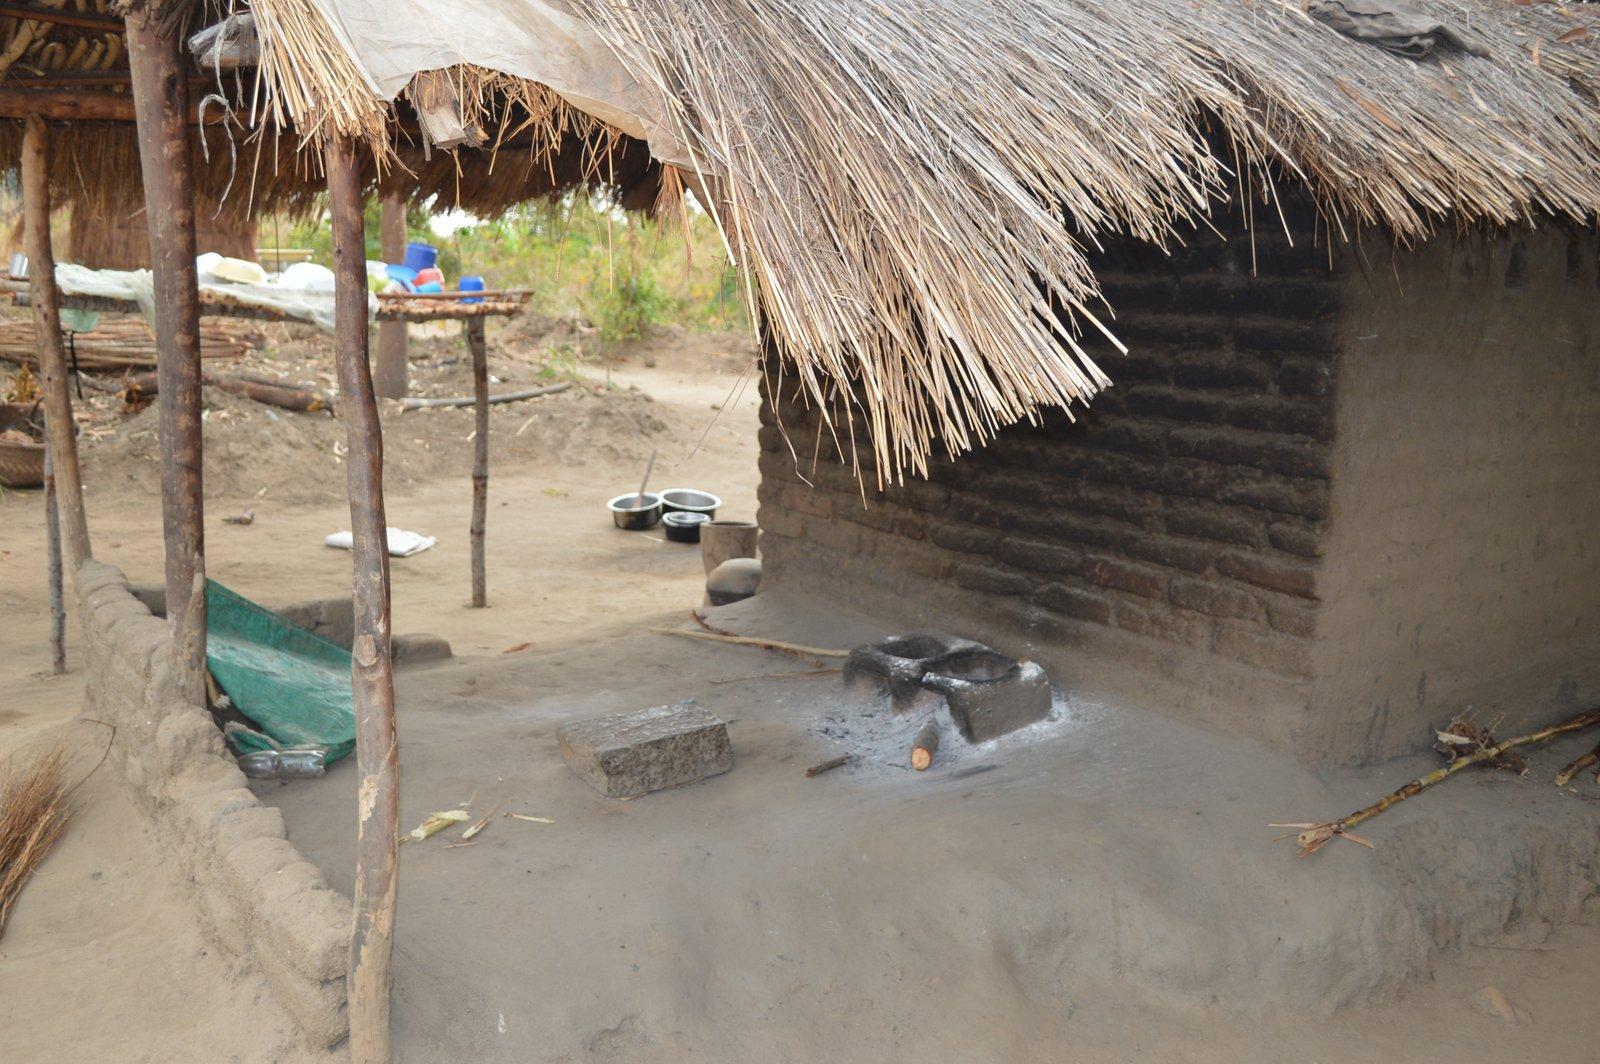 Chikasima, Nkhata Bay (15).JPG